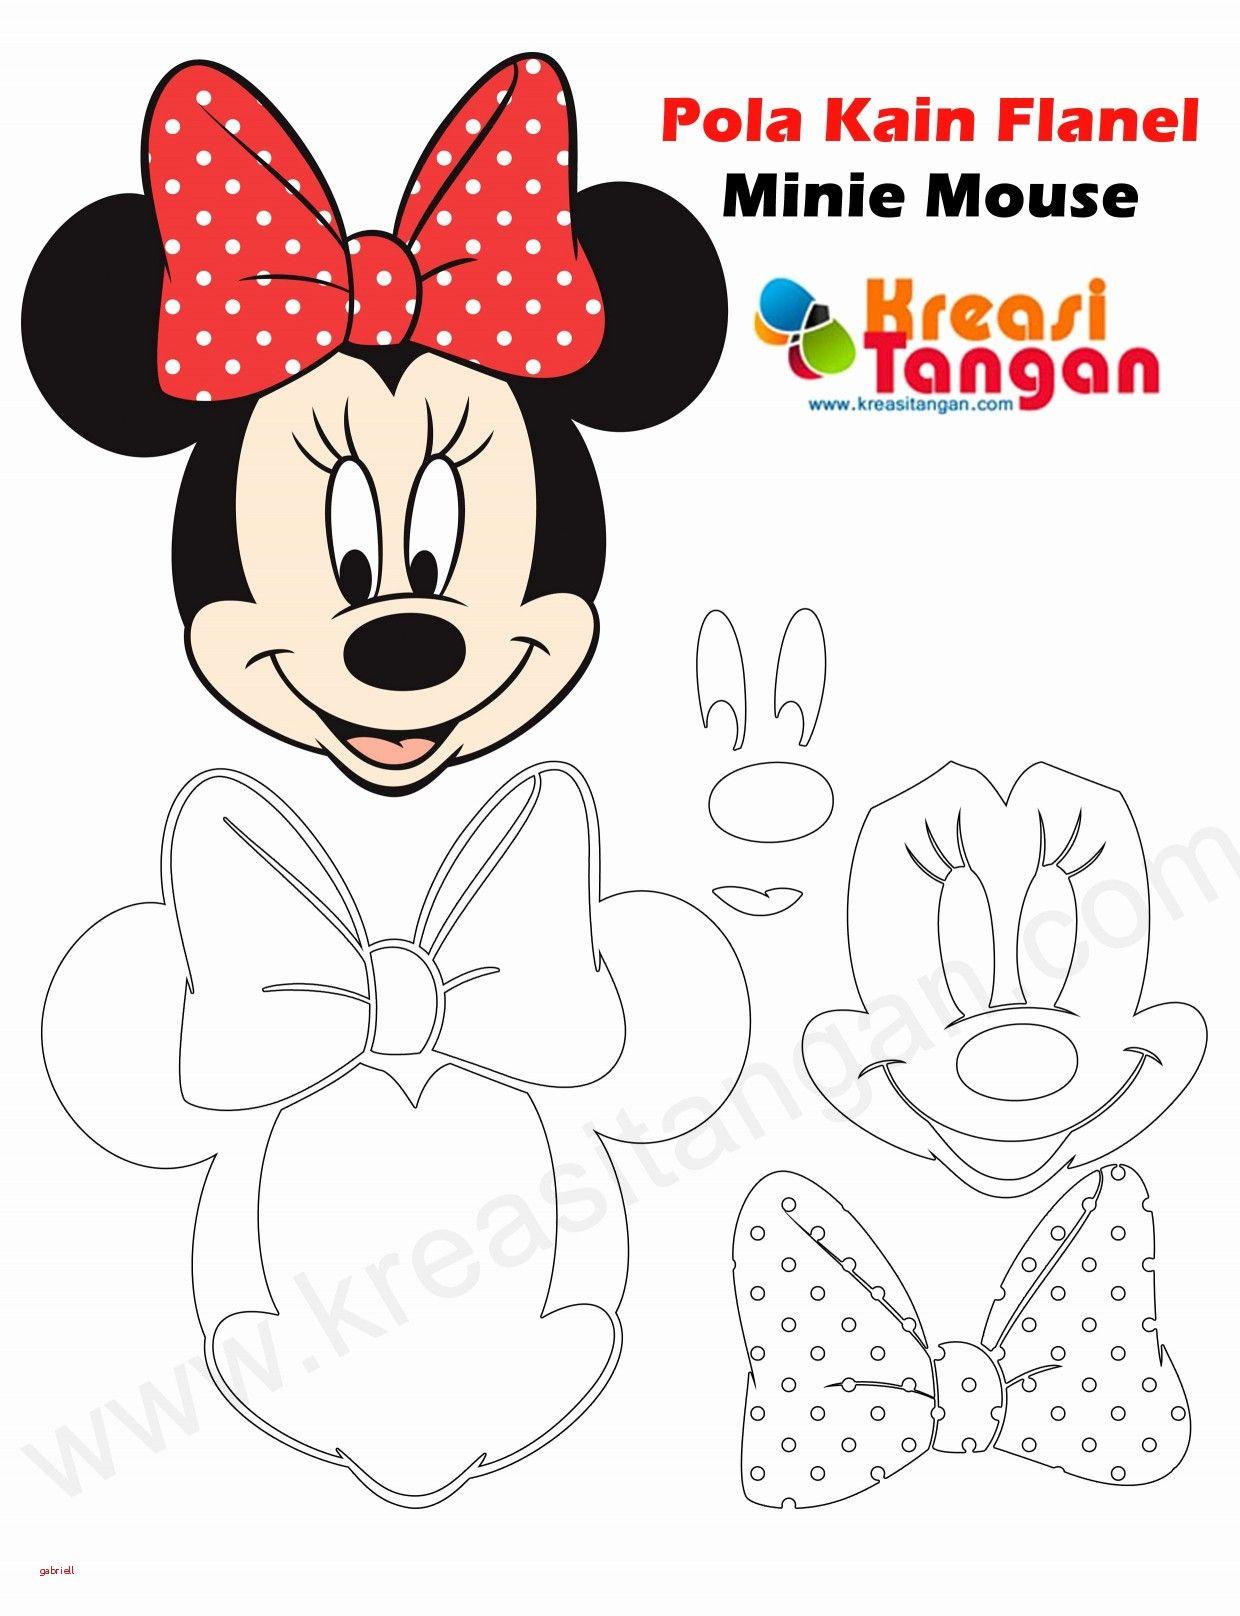 frisch quad malvorlagen gratis   minnie mouse coloring